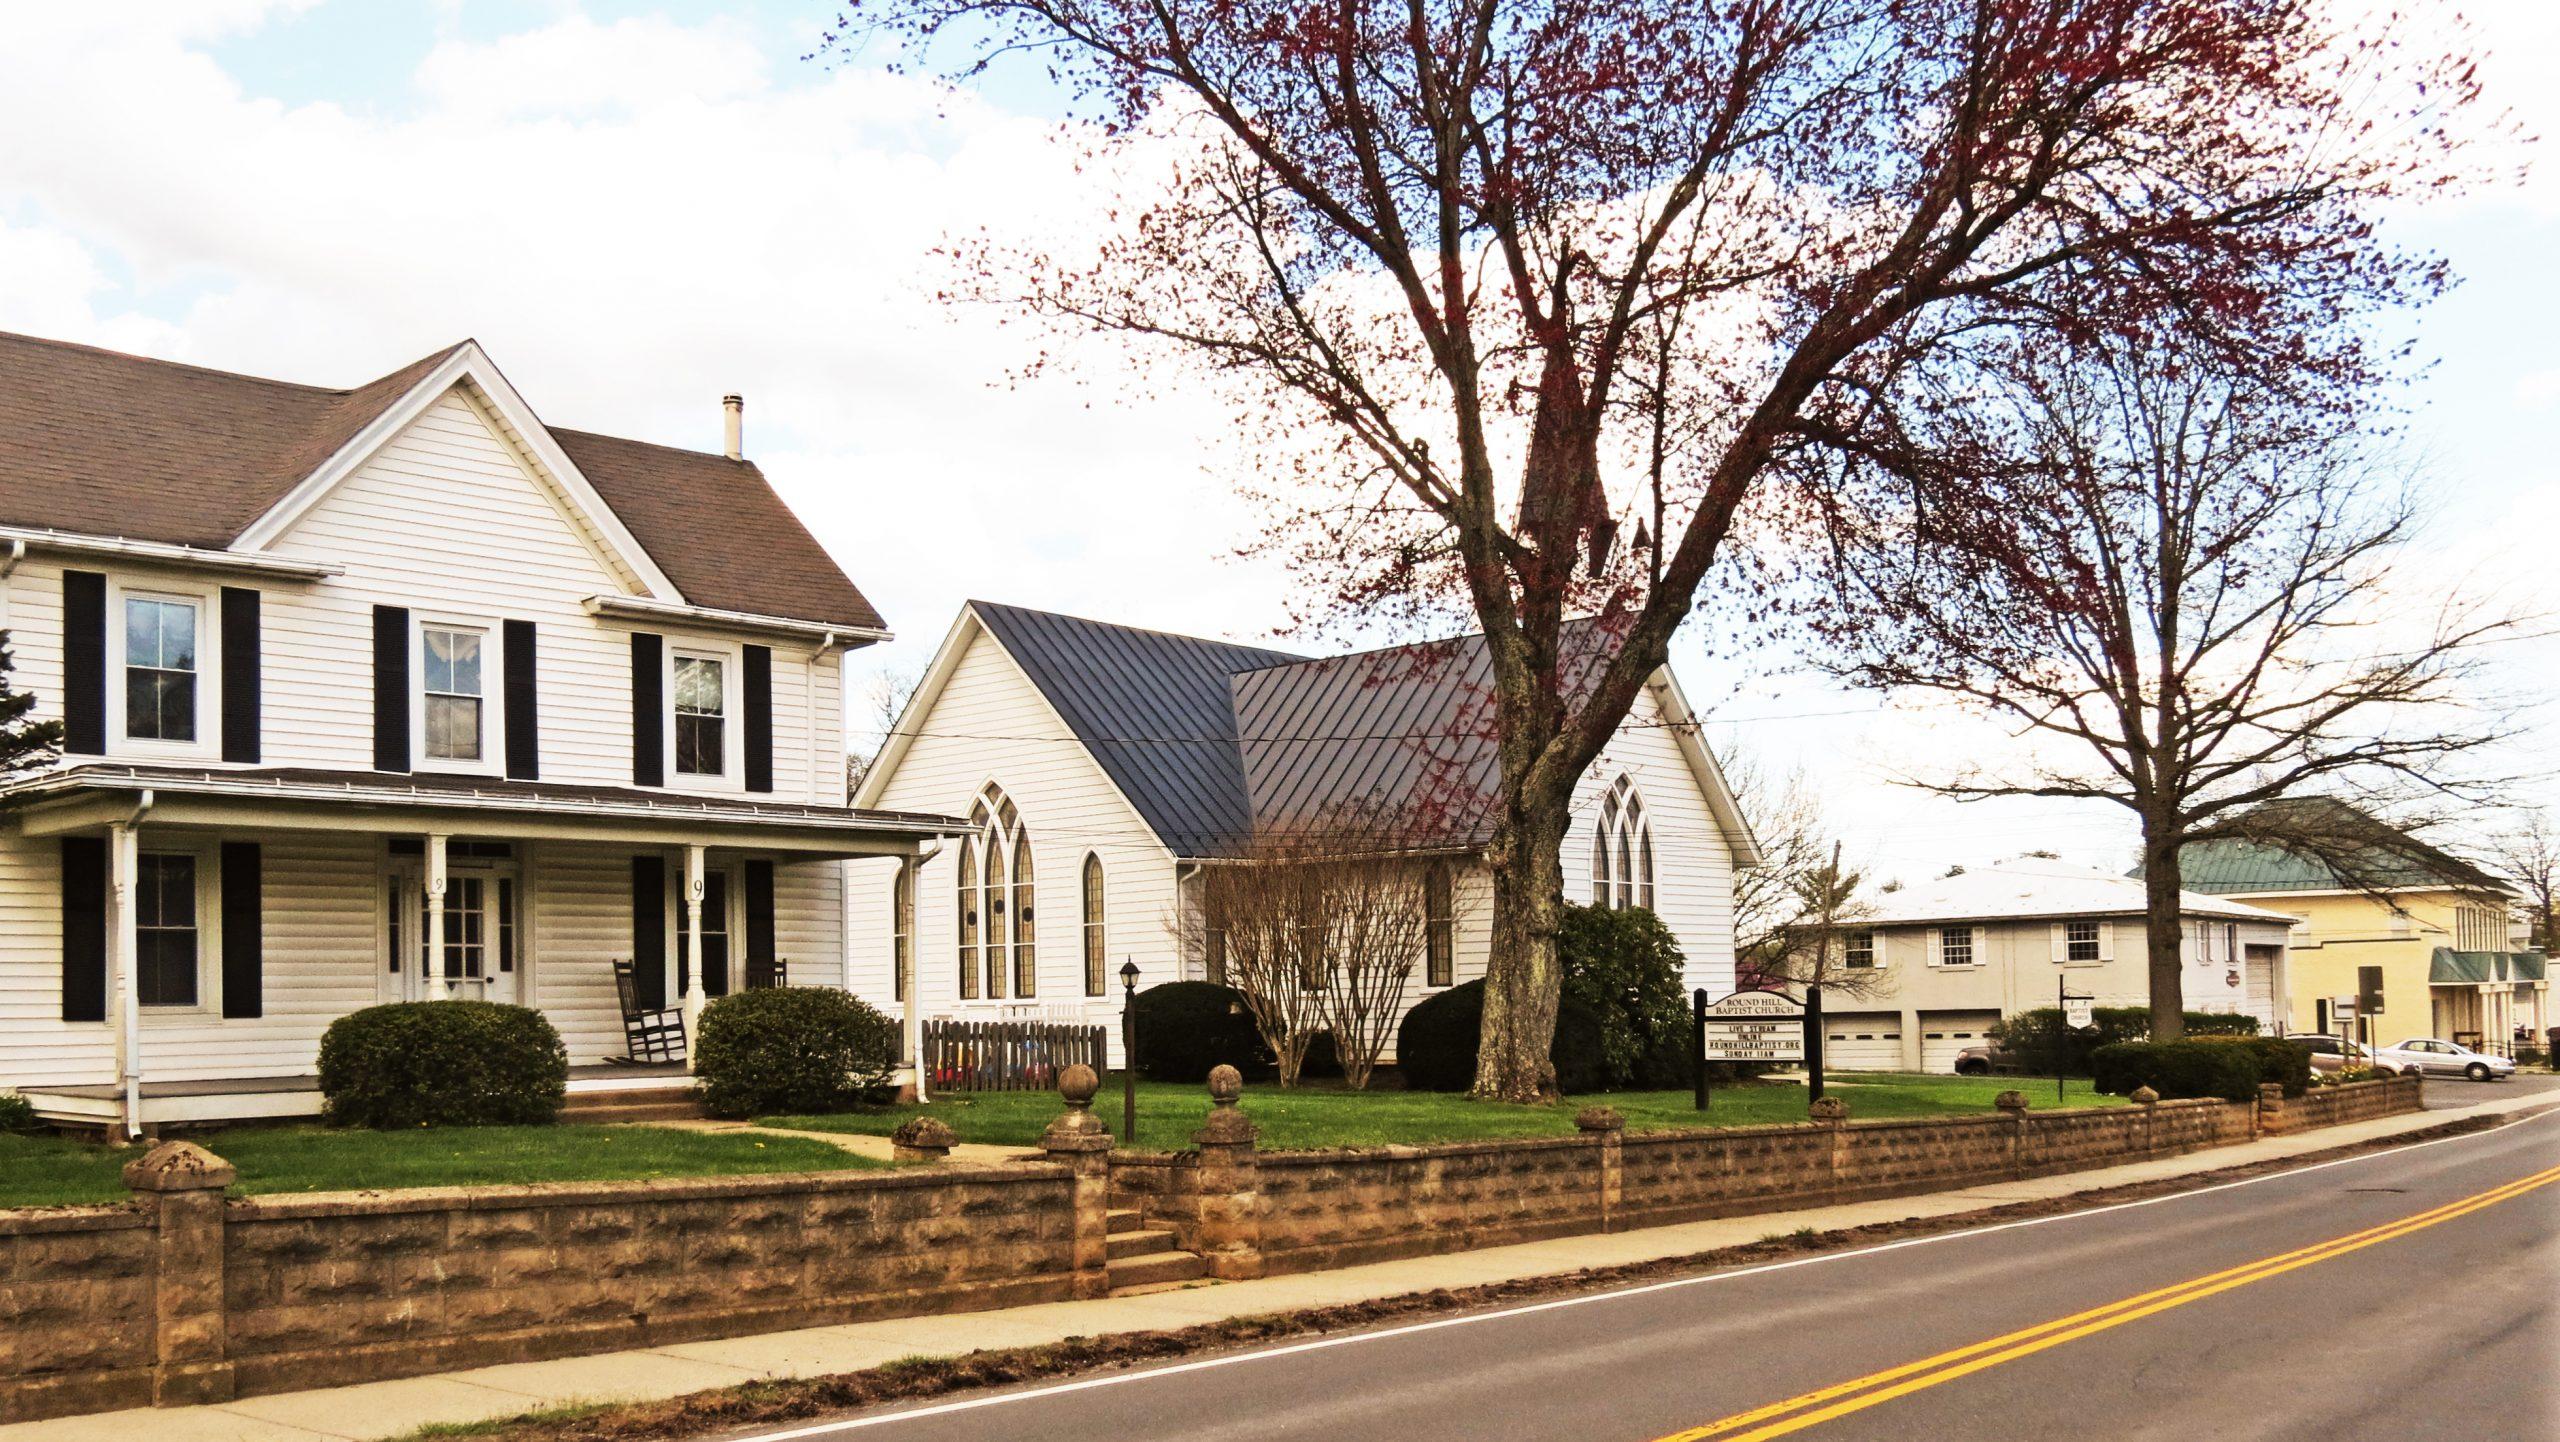 Round Hill Historic District